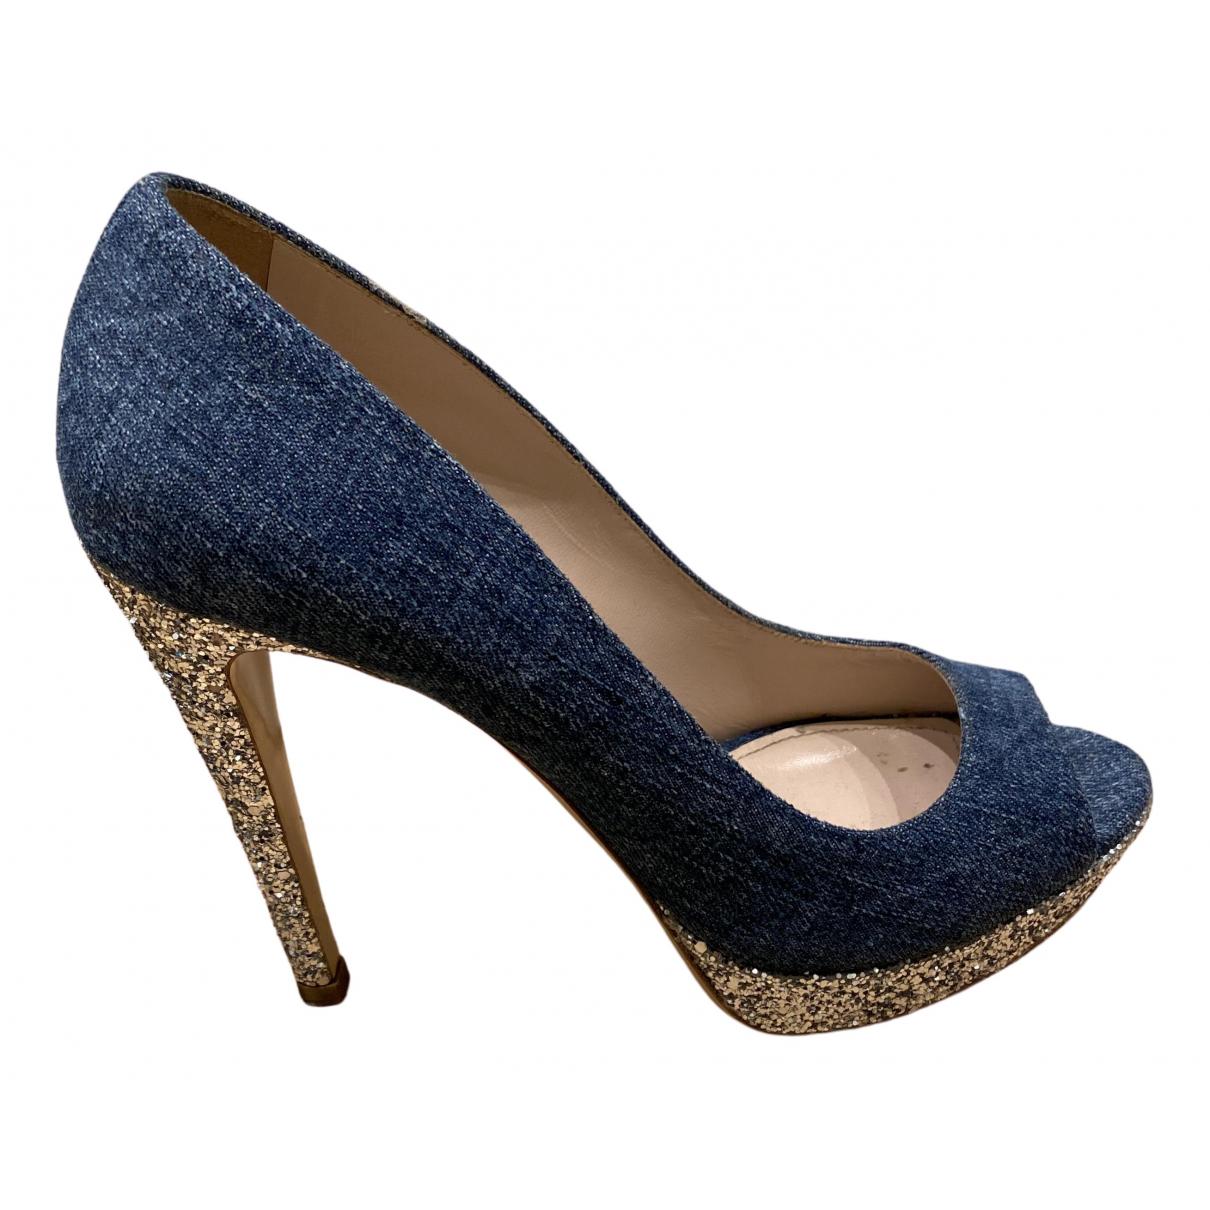 Miu Miu - Escarpins   pour femme en a paillettes - bleu